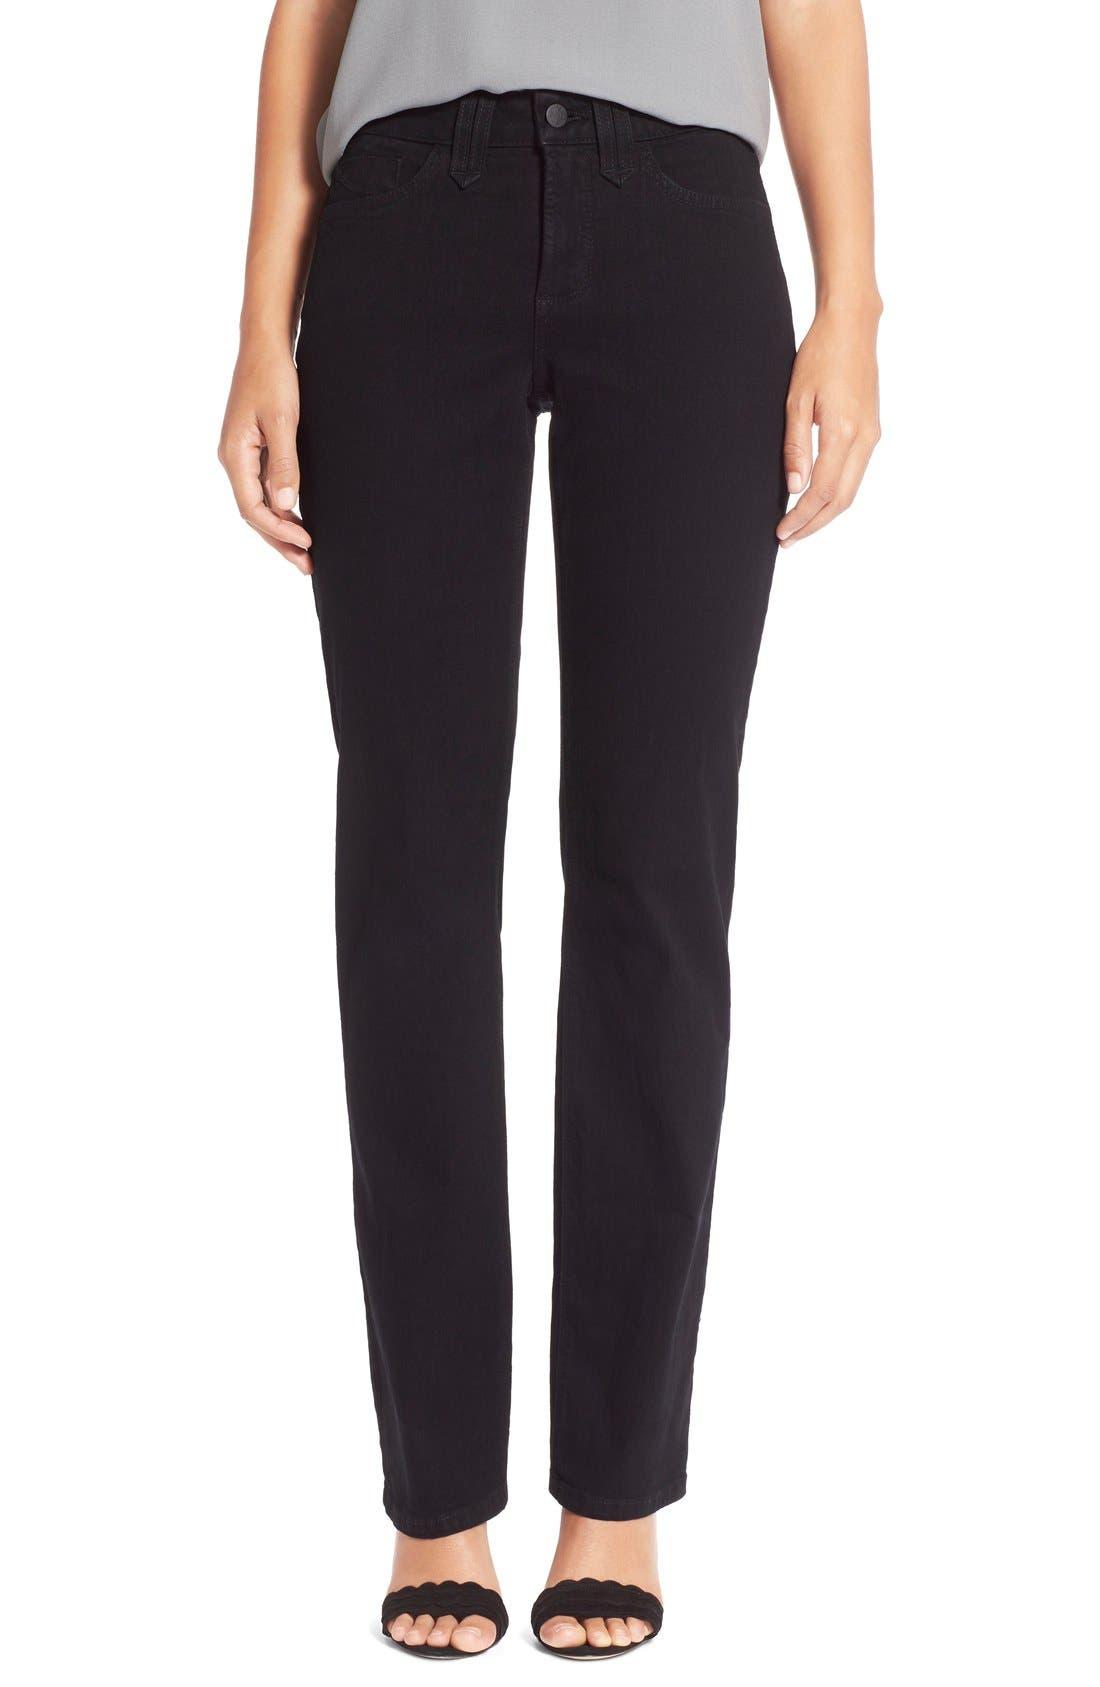 Main Image - NYDJ 'Marilyn' Stretch Straight Leg Jeans (Regular & Petite)